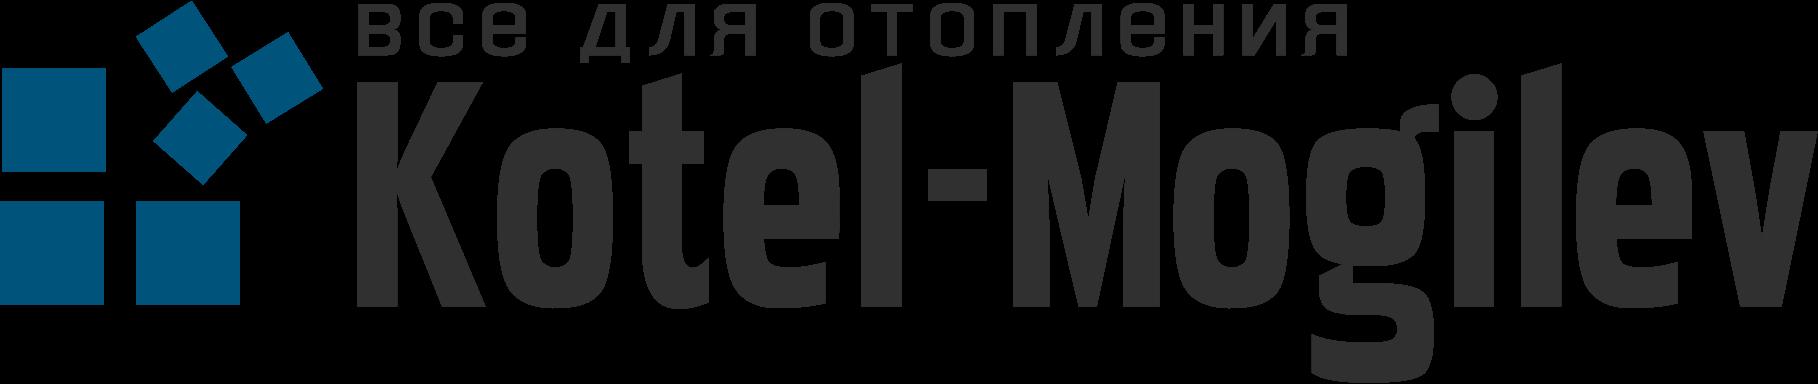 Интернет-магазин Котел-Могилев.бай